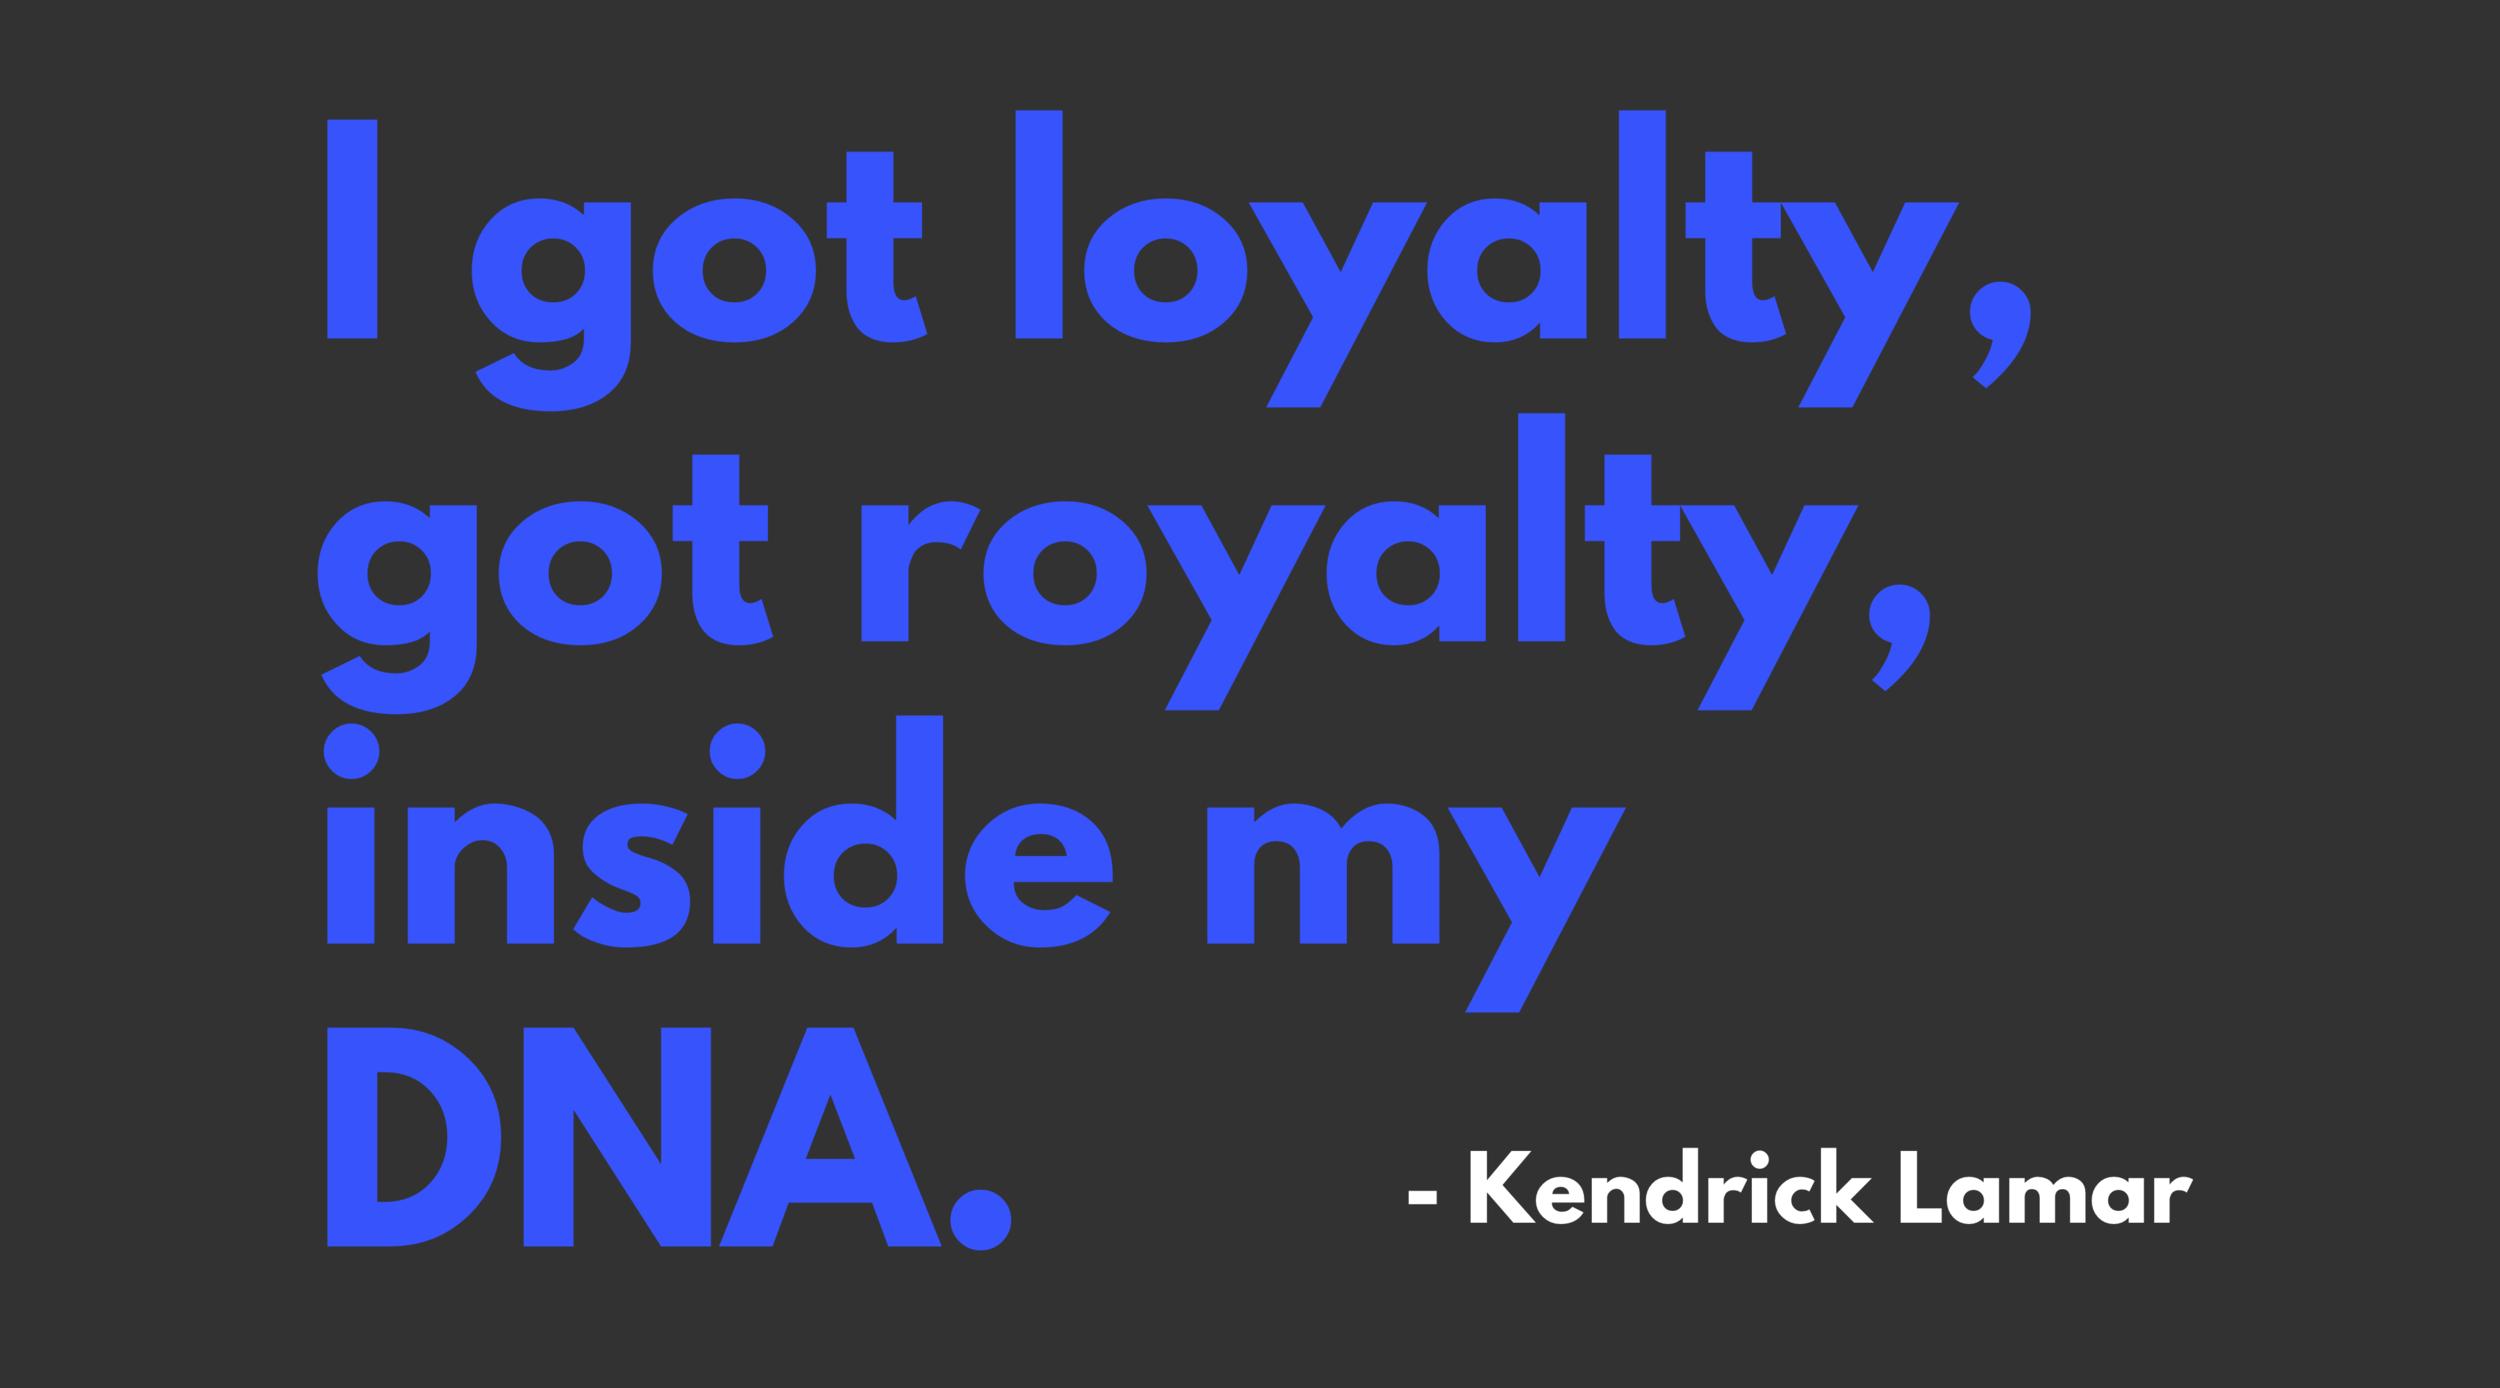 I got loyalty, got royalty, inside my DNA.1-3.png